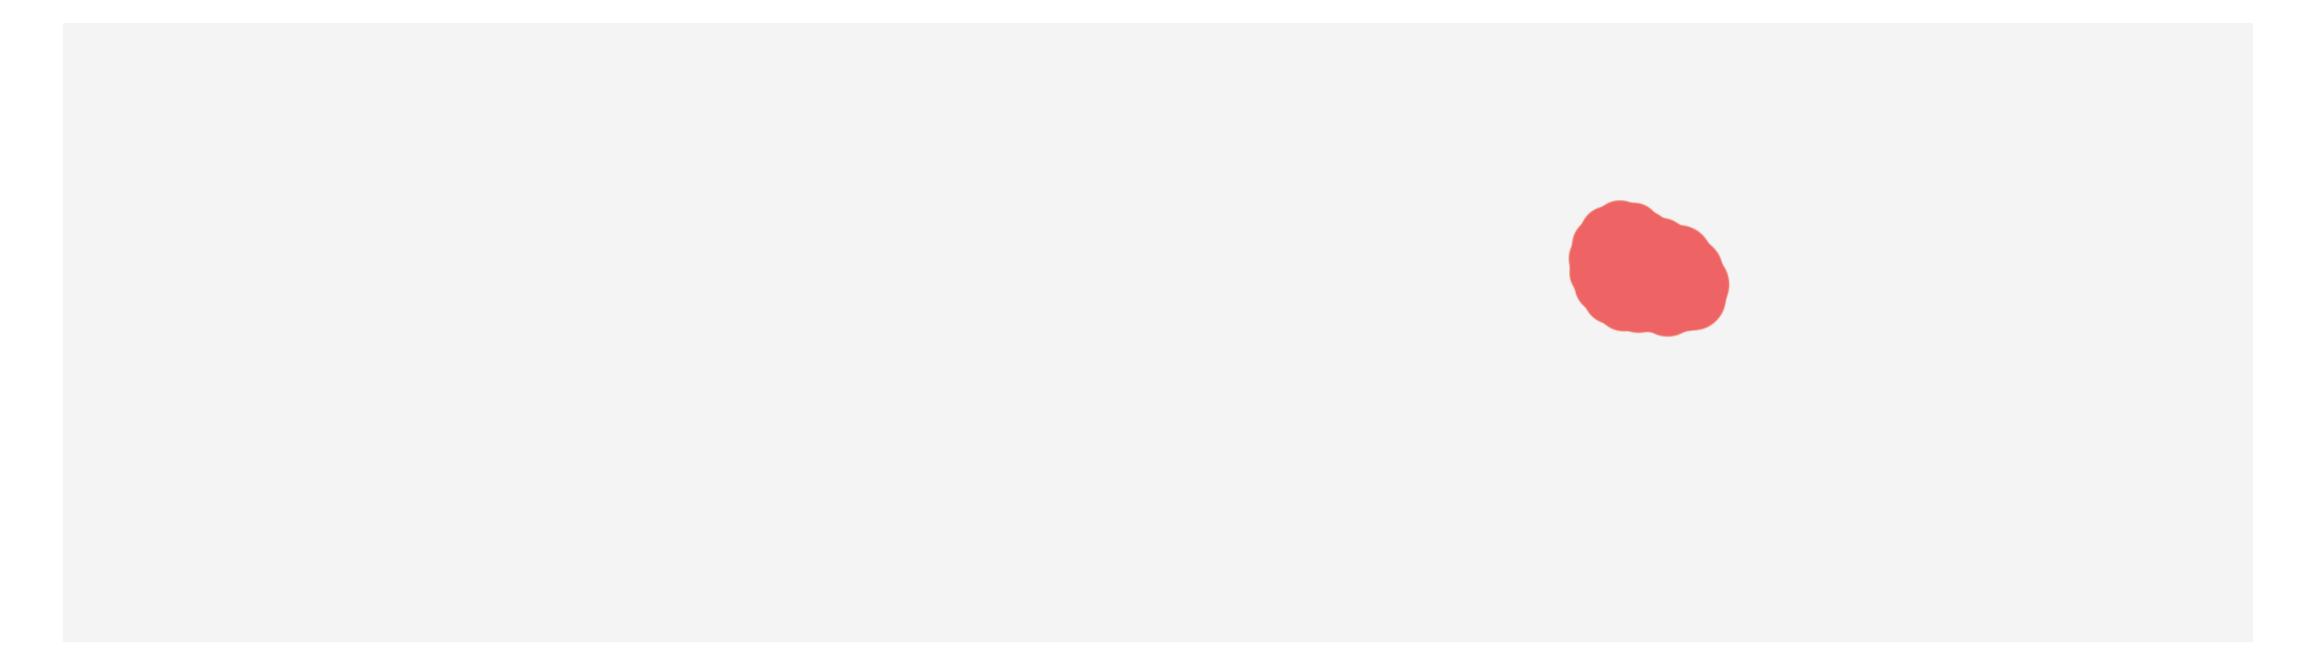 Stephen Lindsay